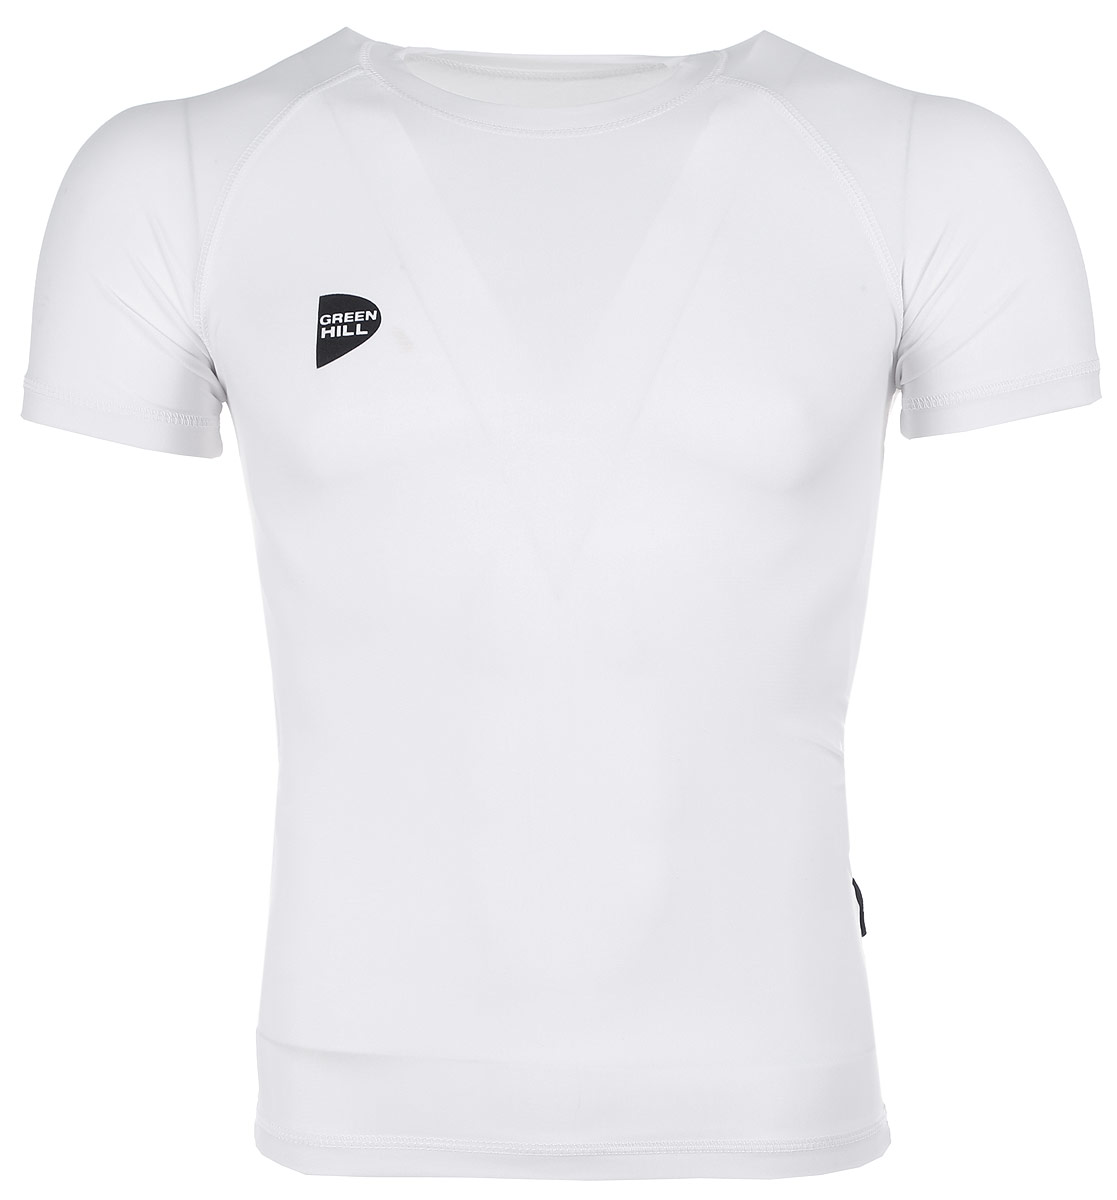 Защитная футболка Green Hill, цвет: белый. Размер XL. RGS-3558fSIB-0014Защитная футболка с длинным рукавом. Материал: полиэстер/лайкра. Размеры: Длина 69 см ширина 45 см длина рукава от плечевого шва 64 см